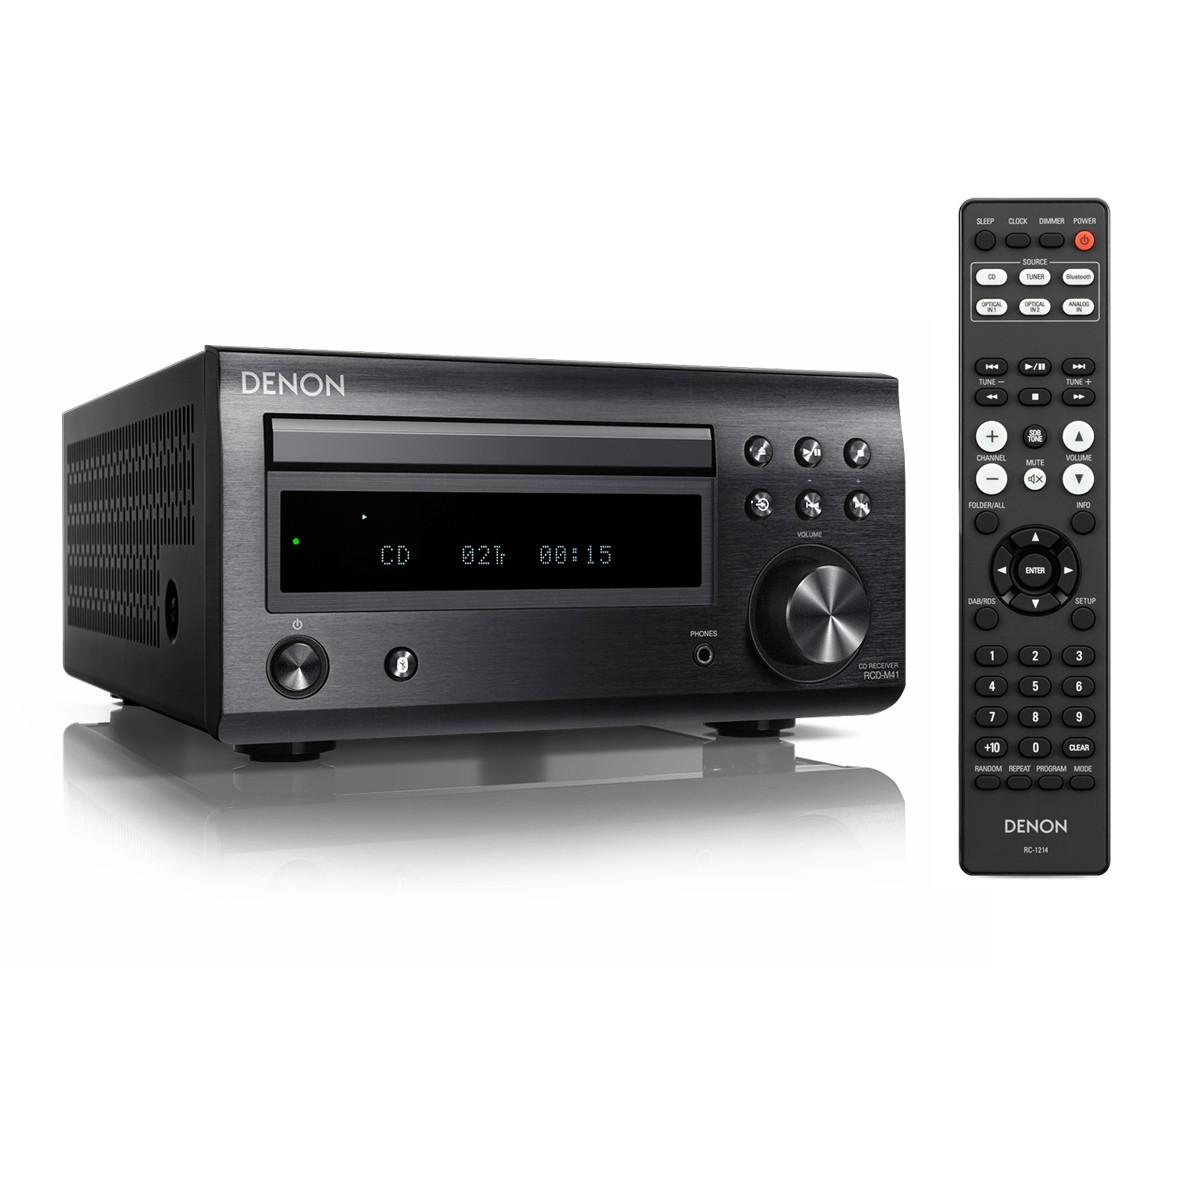 Denon RCD-M 41 DAB schwarz CD-Receiver